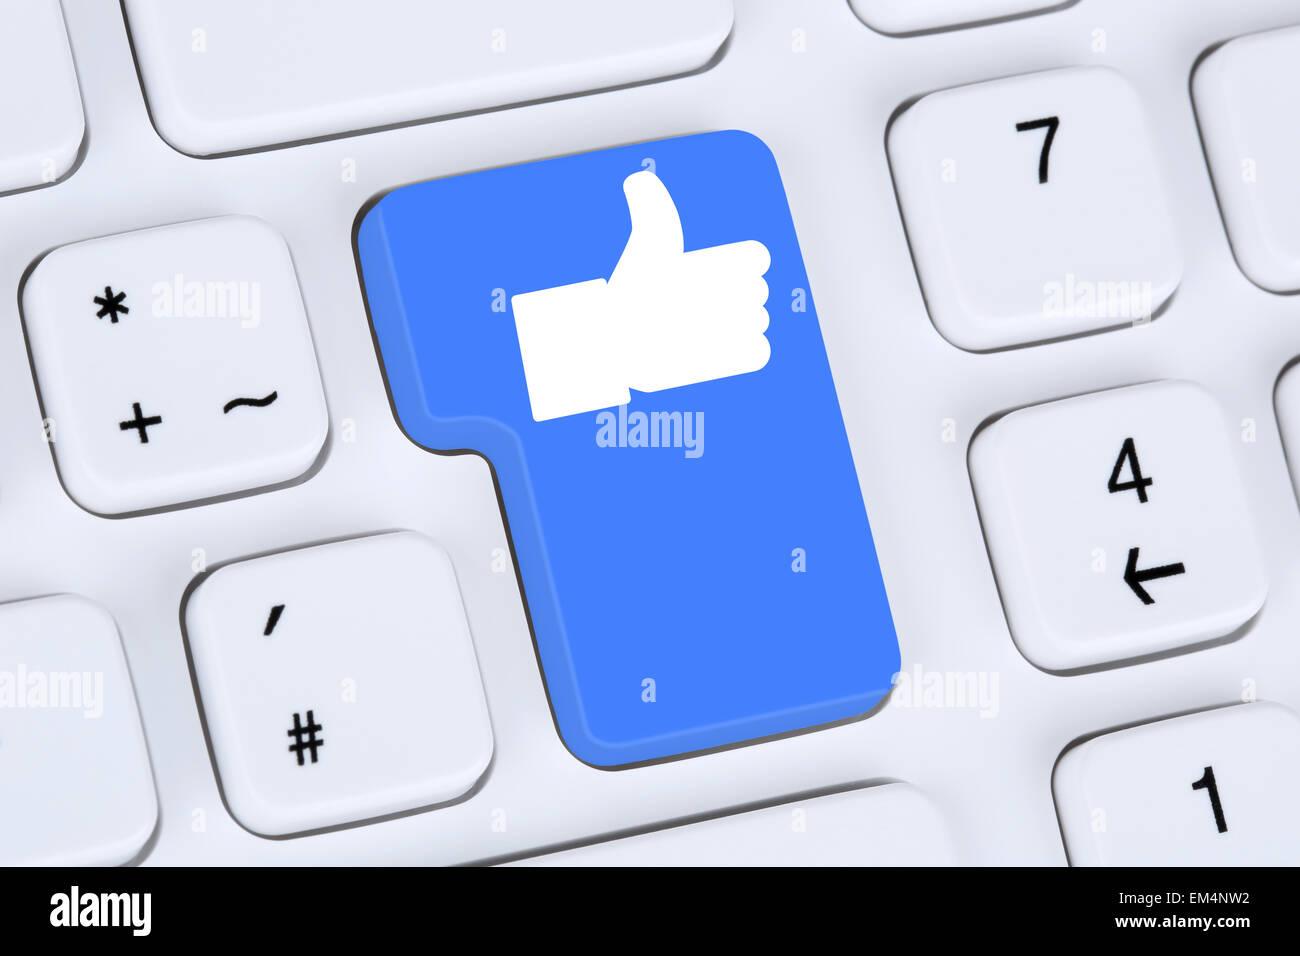 Como botón icono símbolo pulgar arriba los medios de comunicación social o red en internet teclado Imagen De Stock